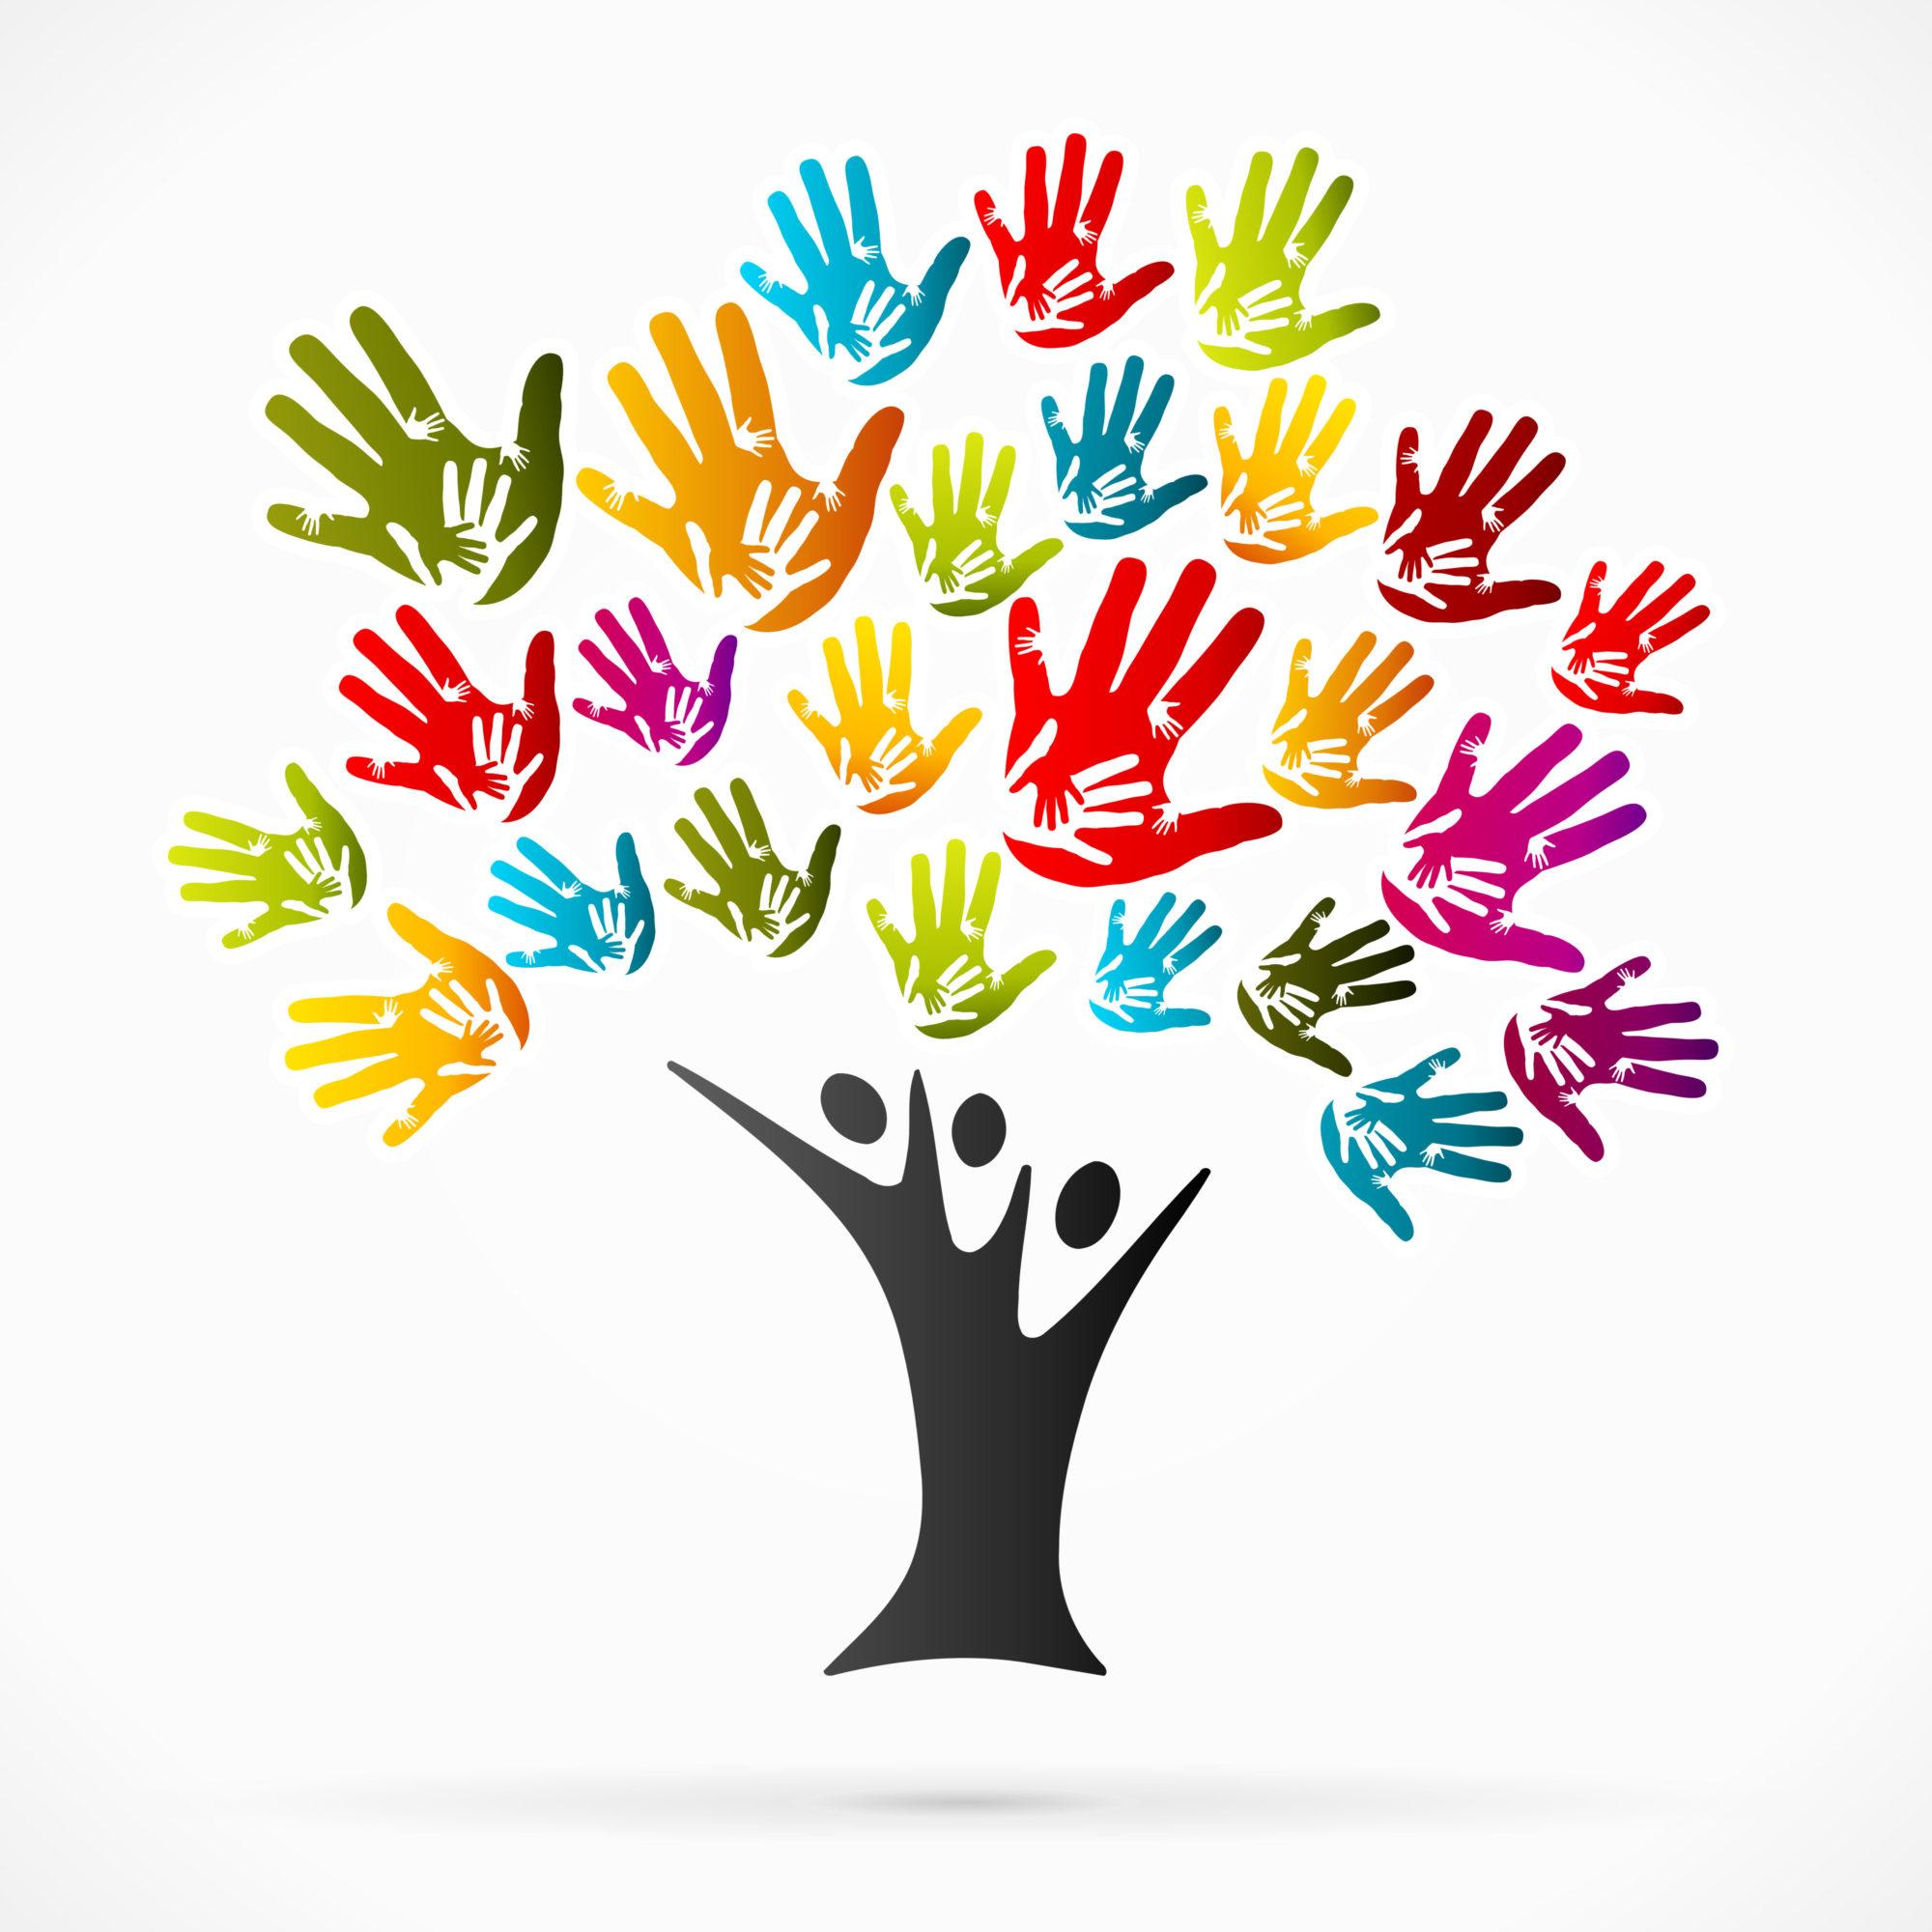 Helping tree graphic image